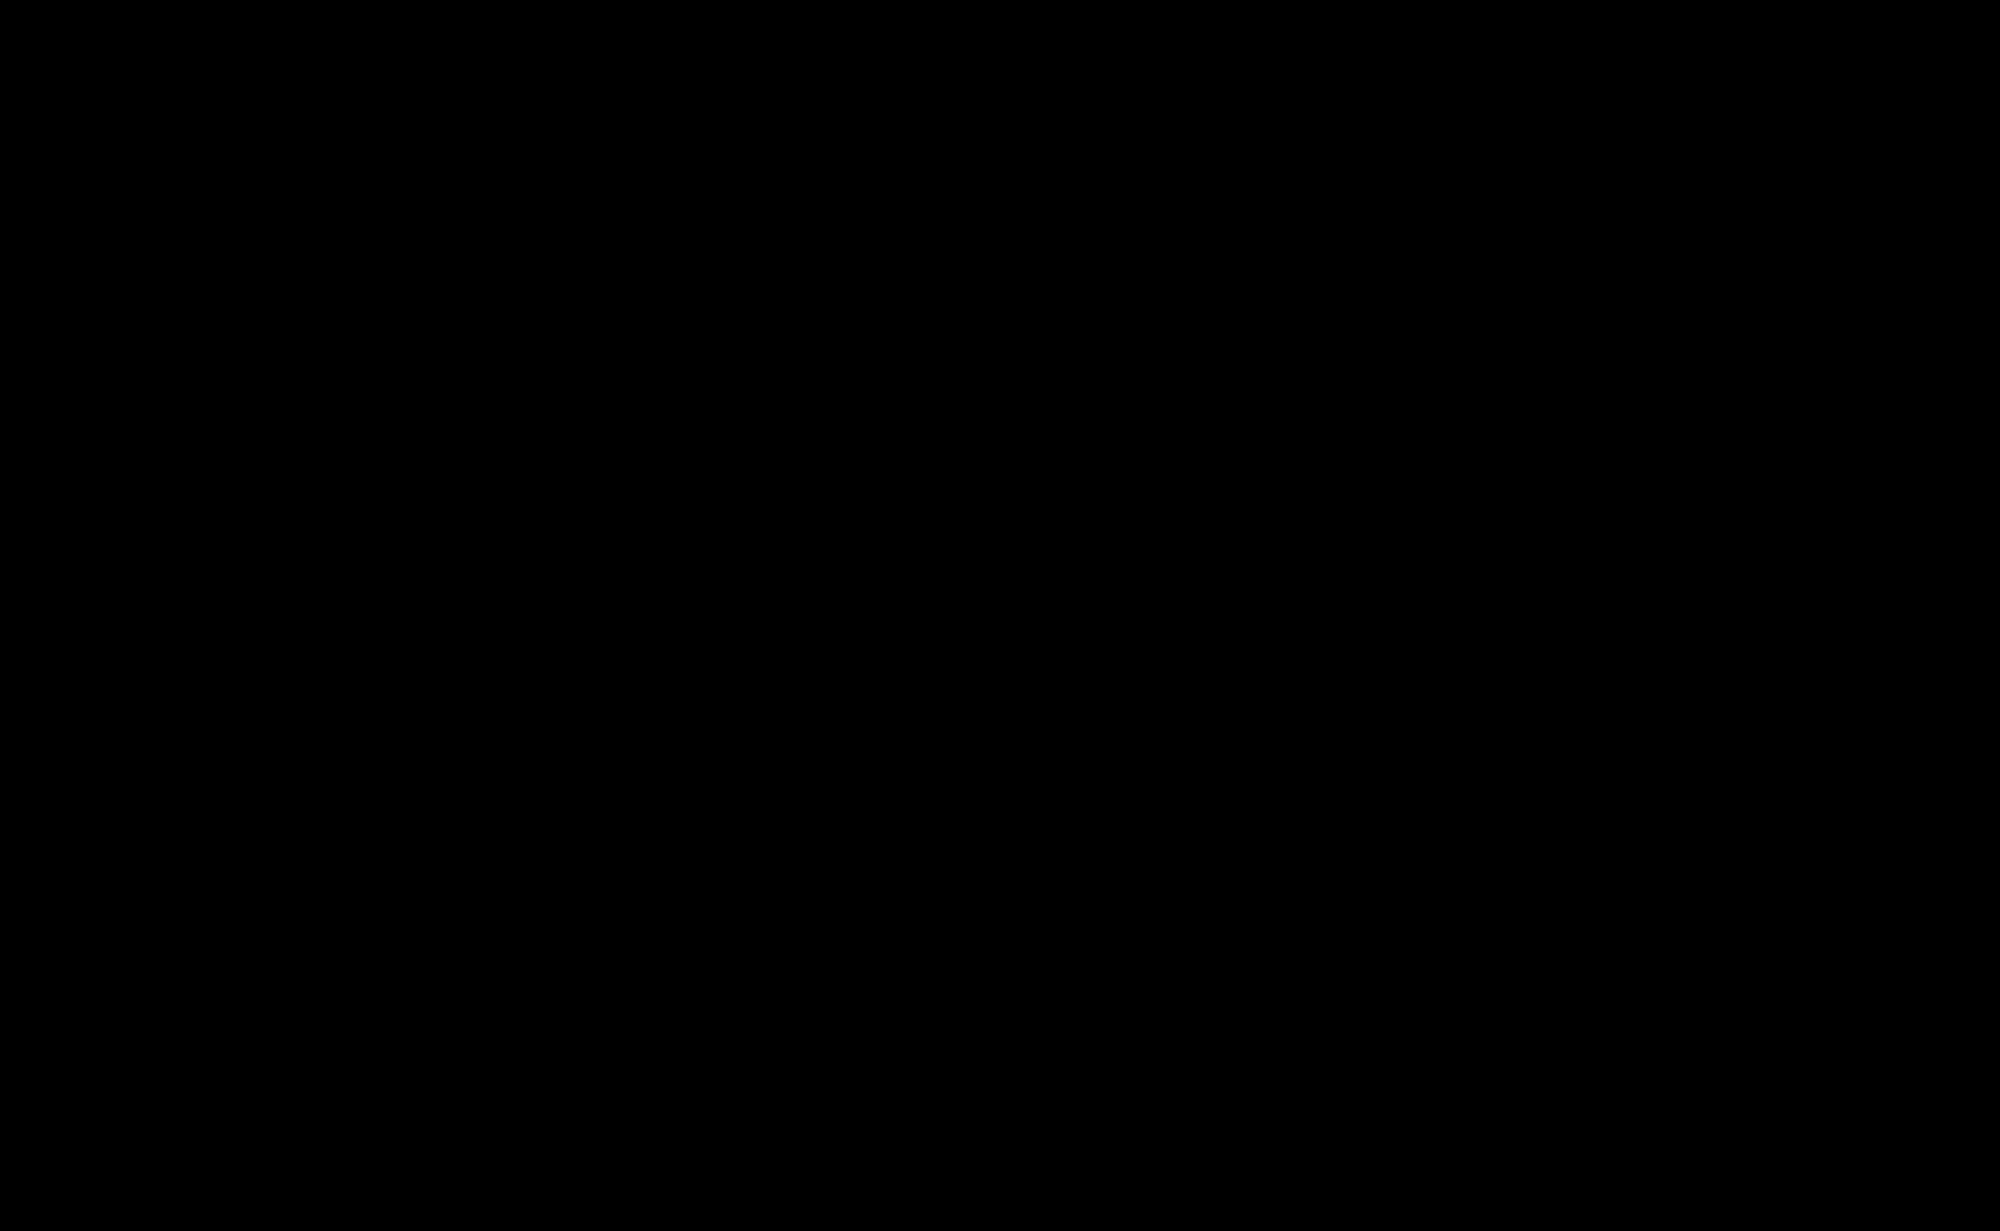 2000px-Converse_logo_svg.png